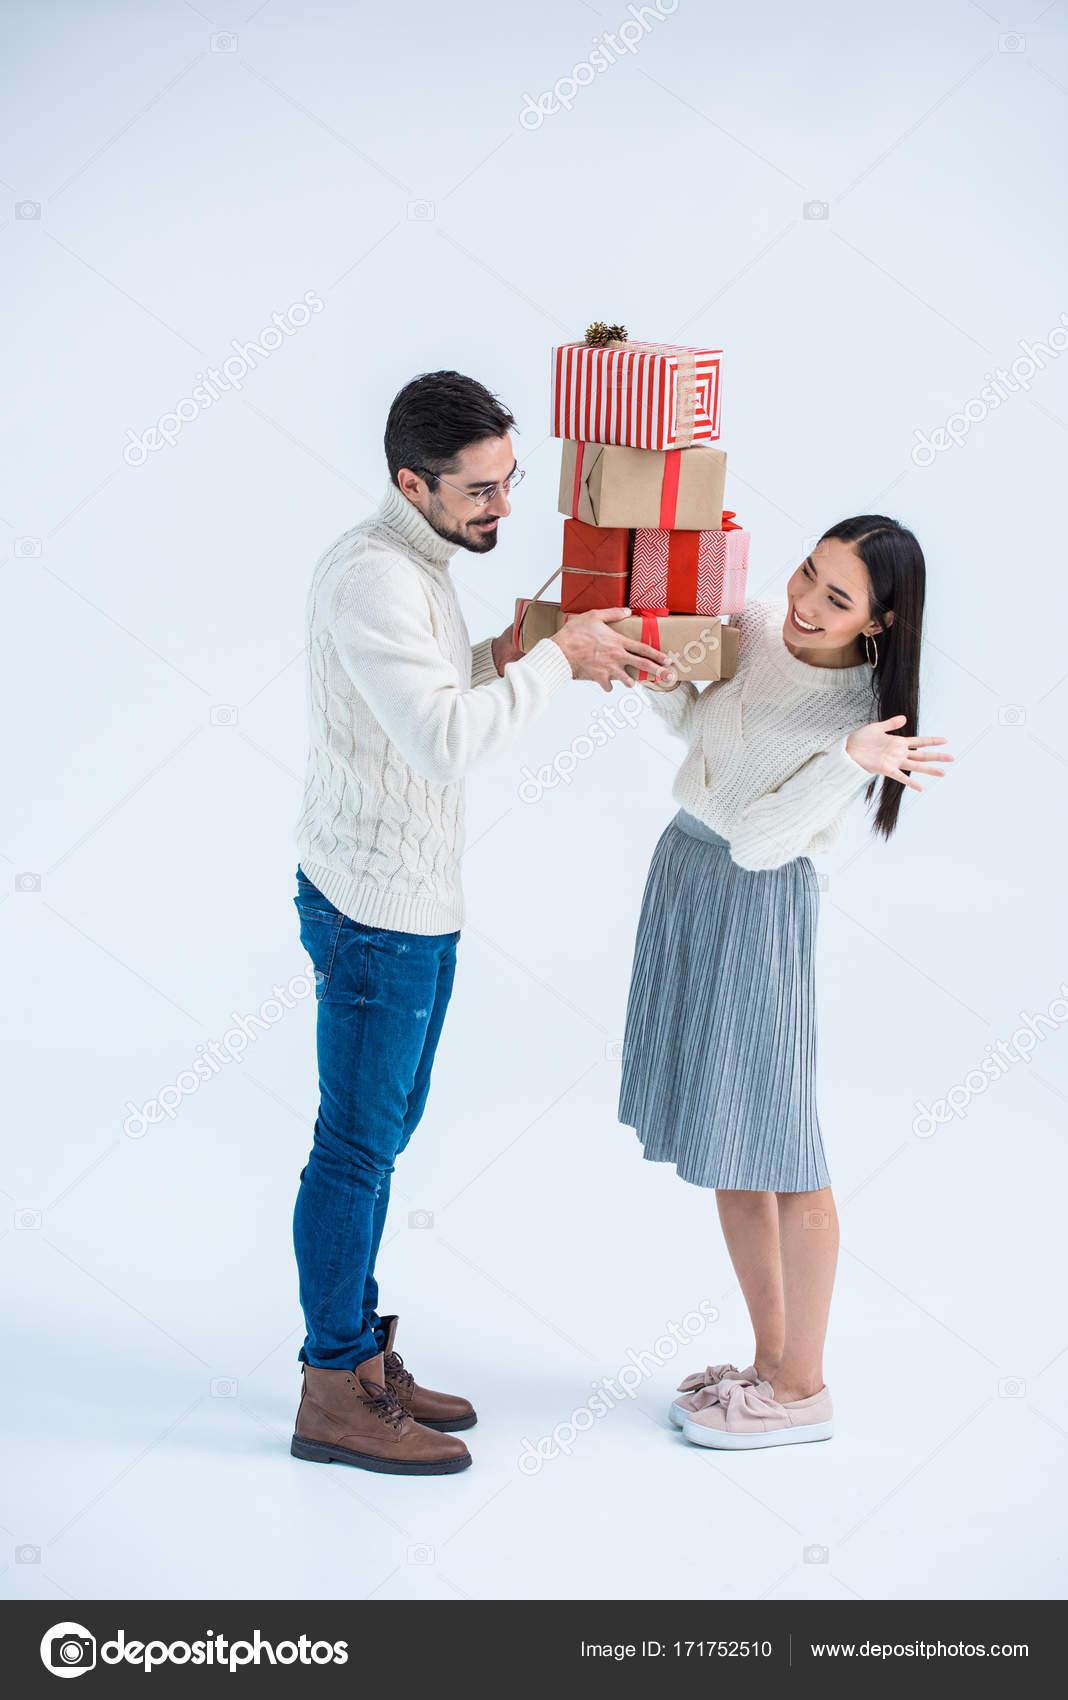 multikulturelles paar halten Weihnachtsgeschenke — Stockfoto ...